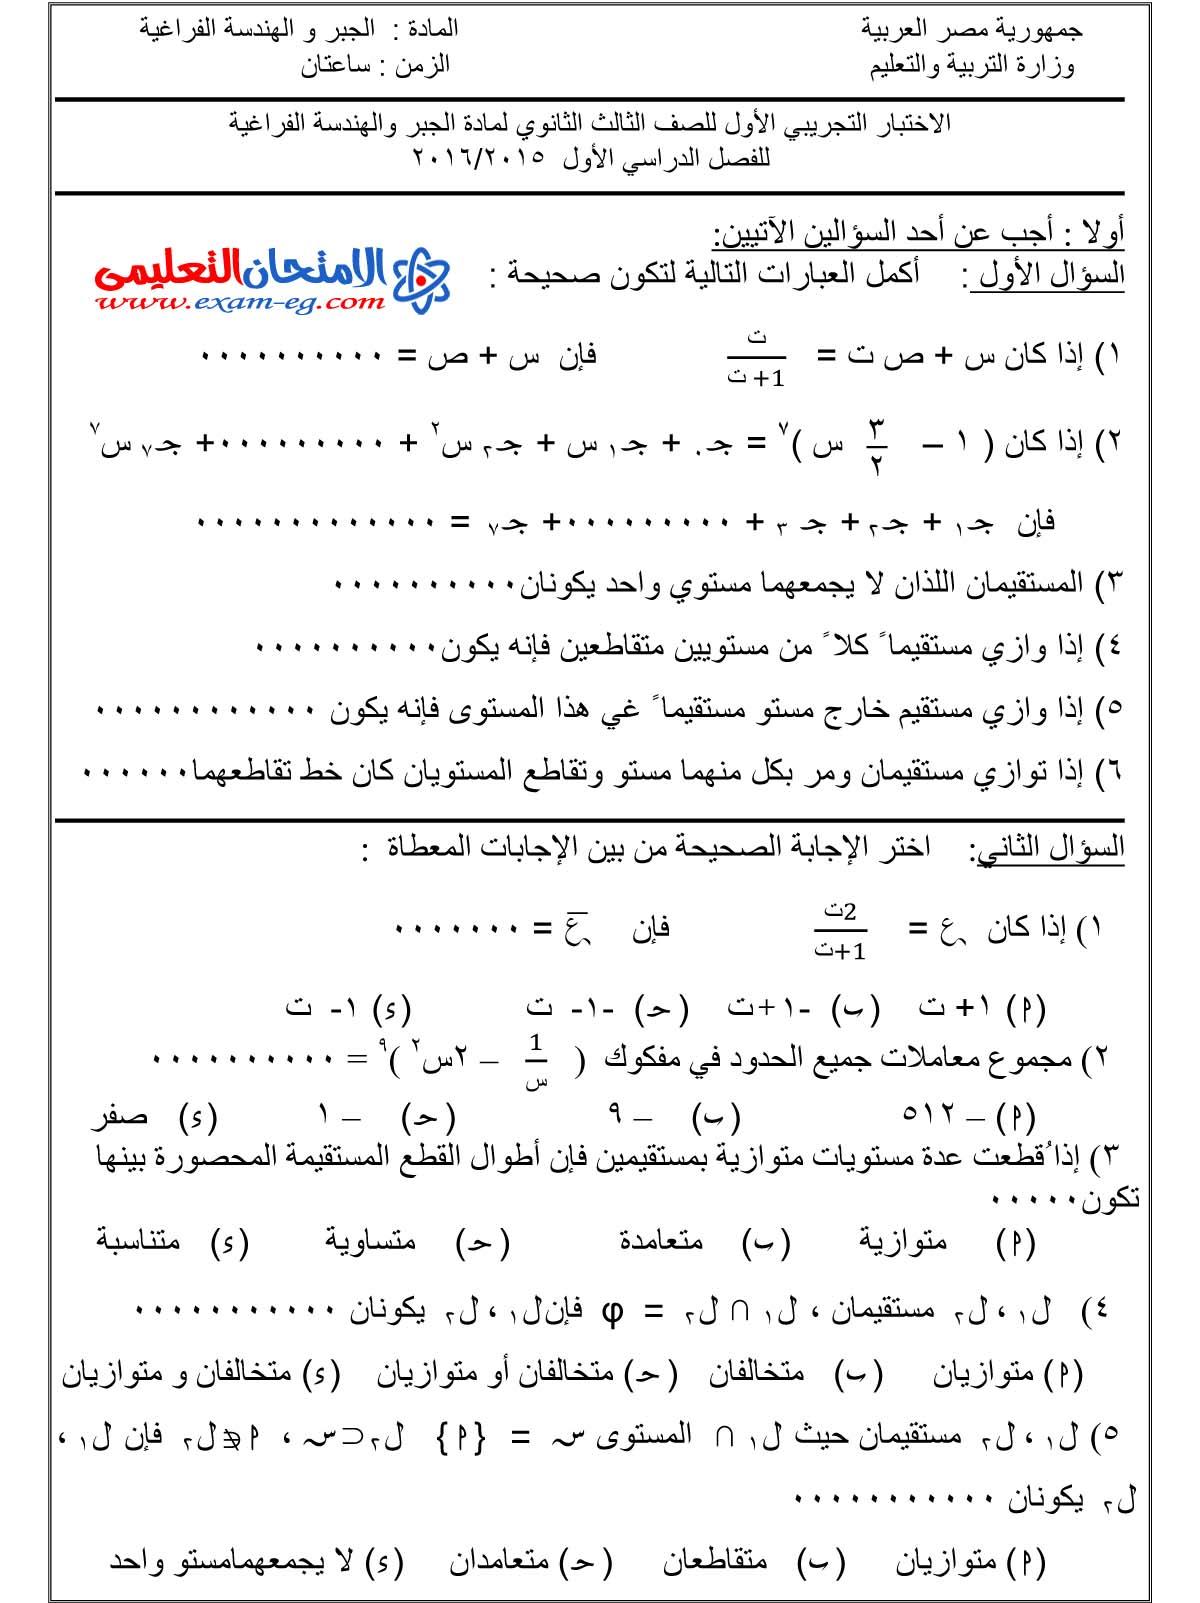 exam-eg.com_146042118281.jpg